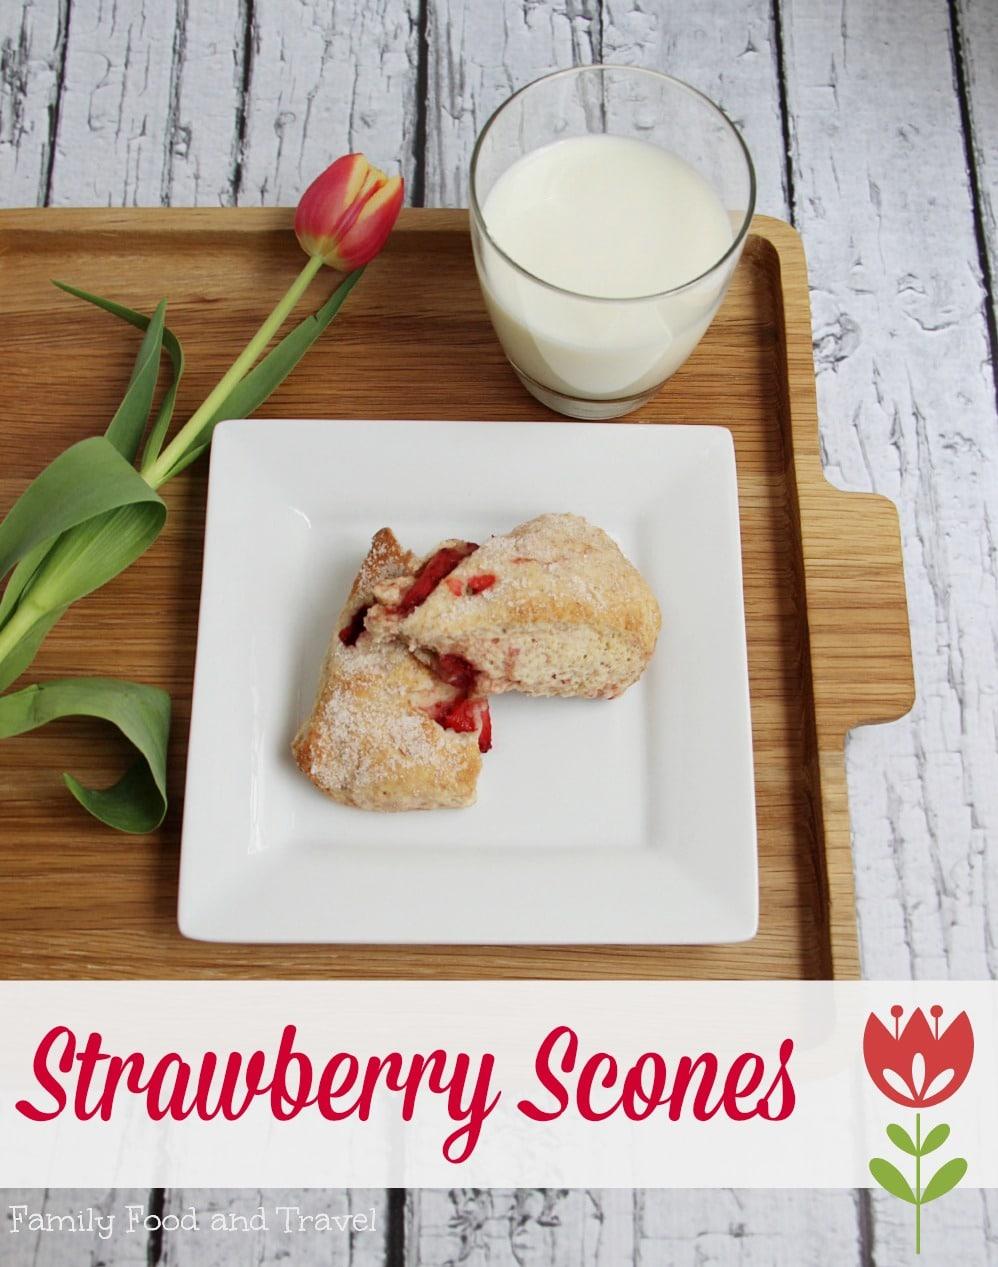 Strawberry Scones a